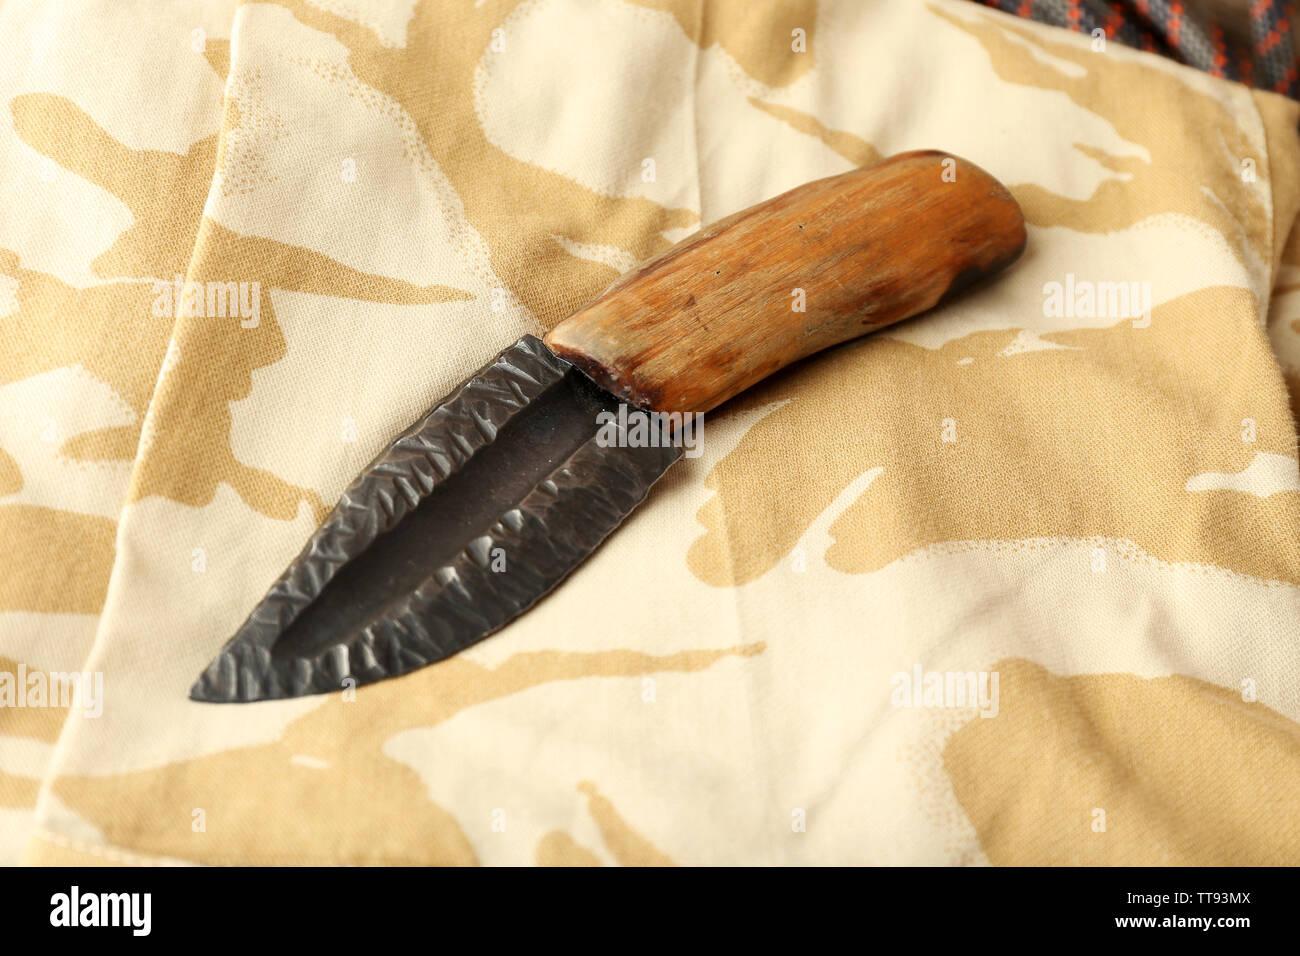 Hunting knife on military cloth, closeup - Stock Image